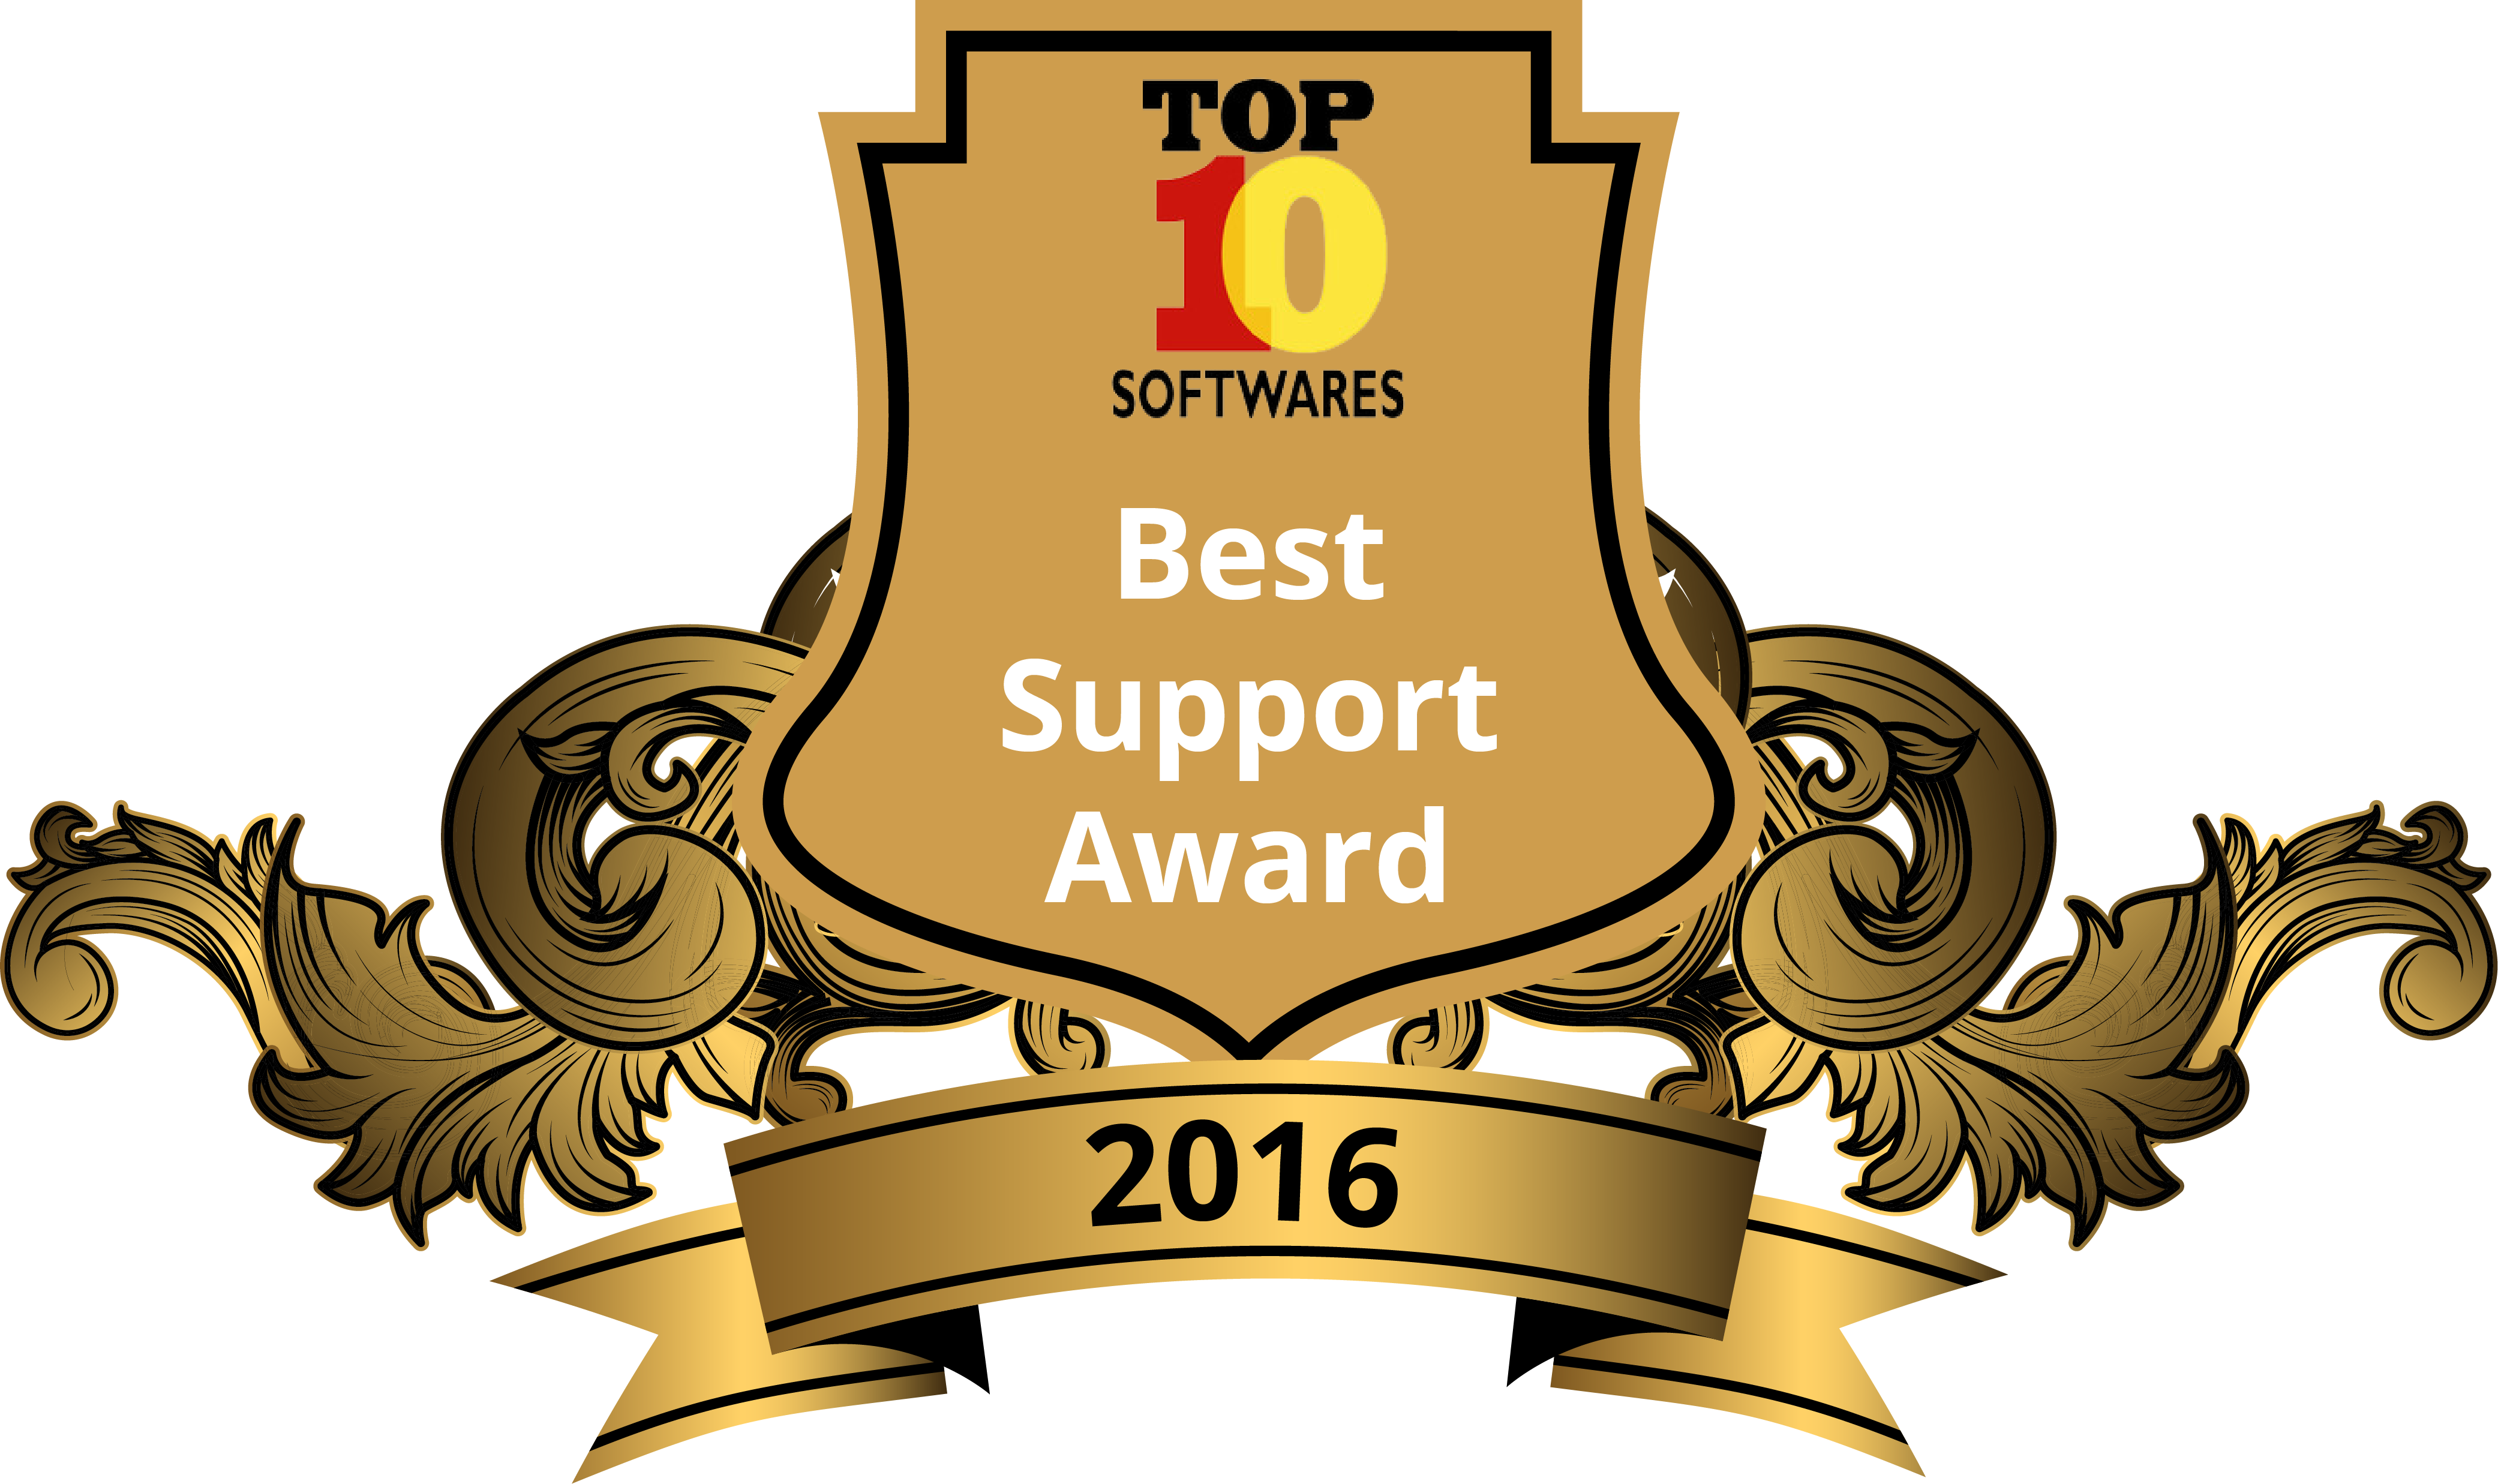 Top10 Best Support